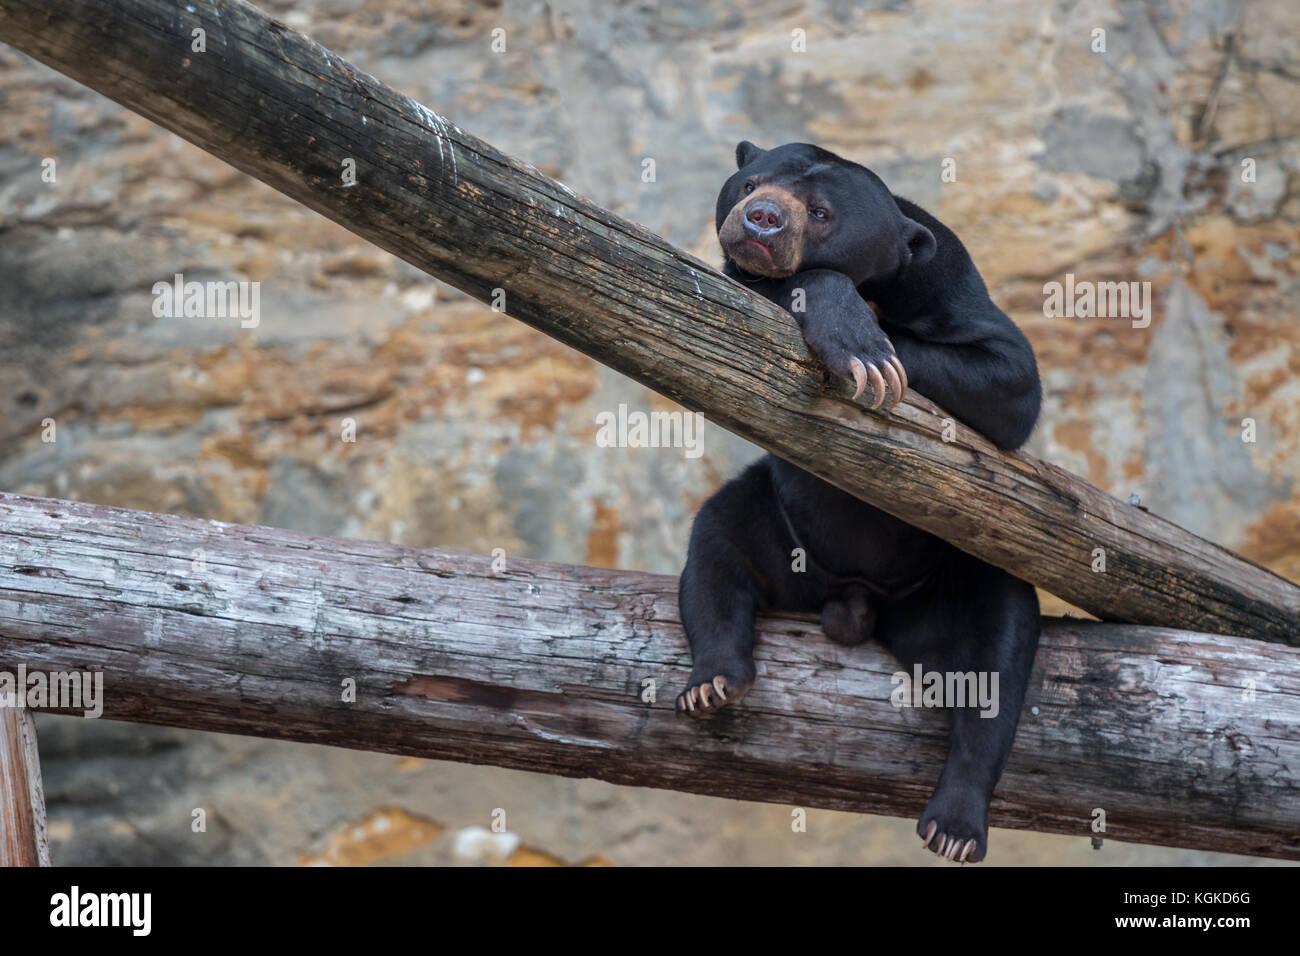 Black Bear Cub Resting on Tree Trunk - Stock Image